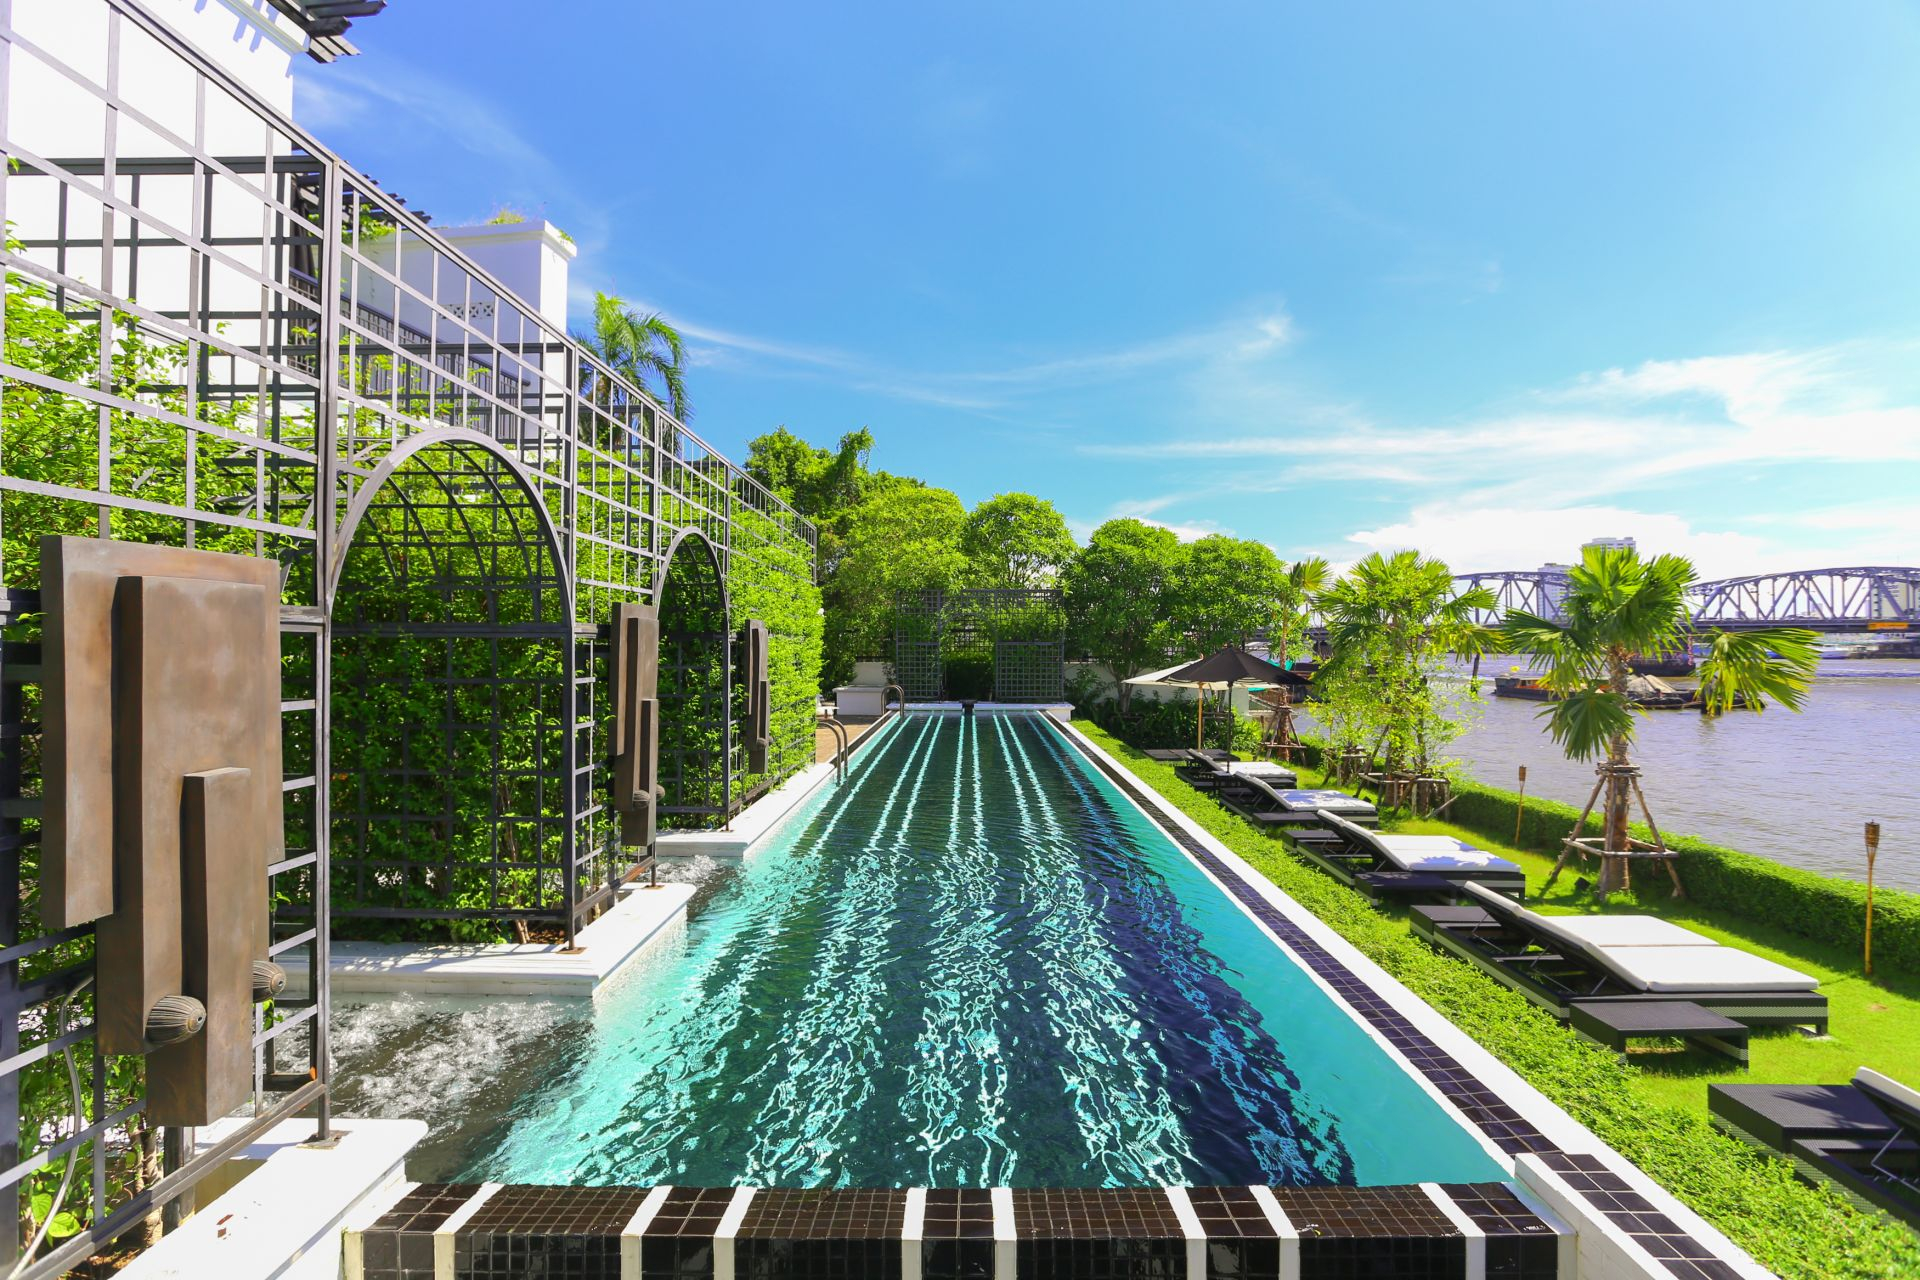 The Siam Hotel - Bangkok, Thailand